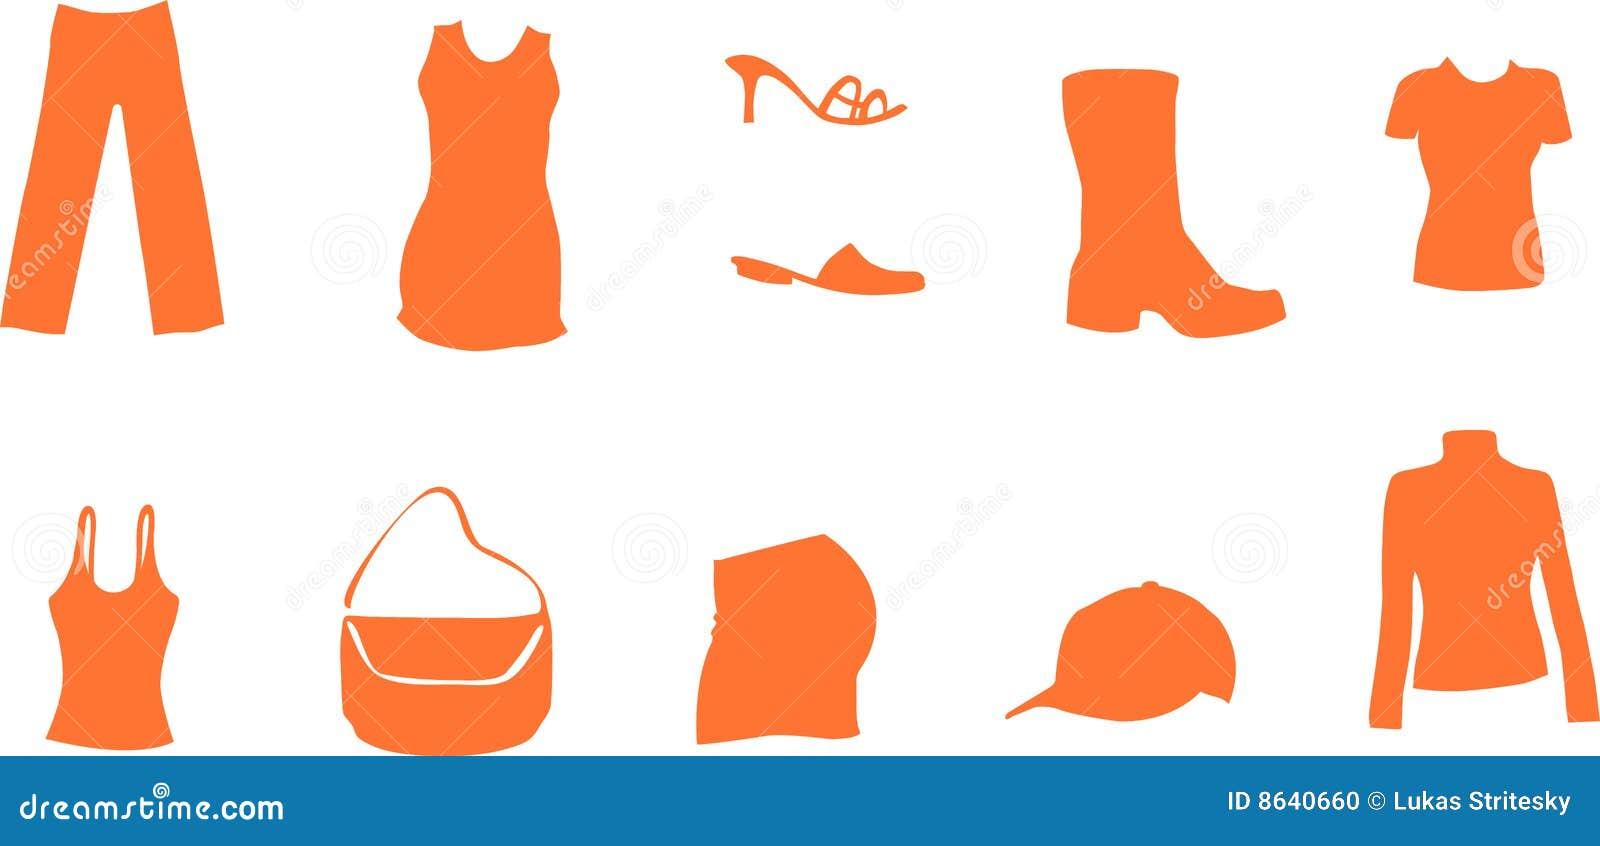 Fashion And Mode Symbols Like Shirt Shoe Dress Bag Stock Photo - Image ...